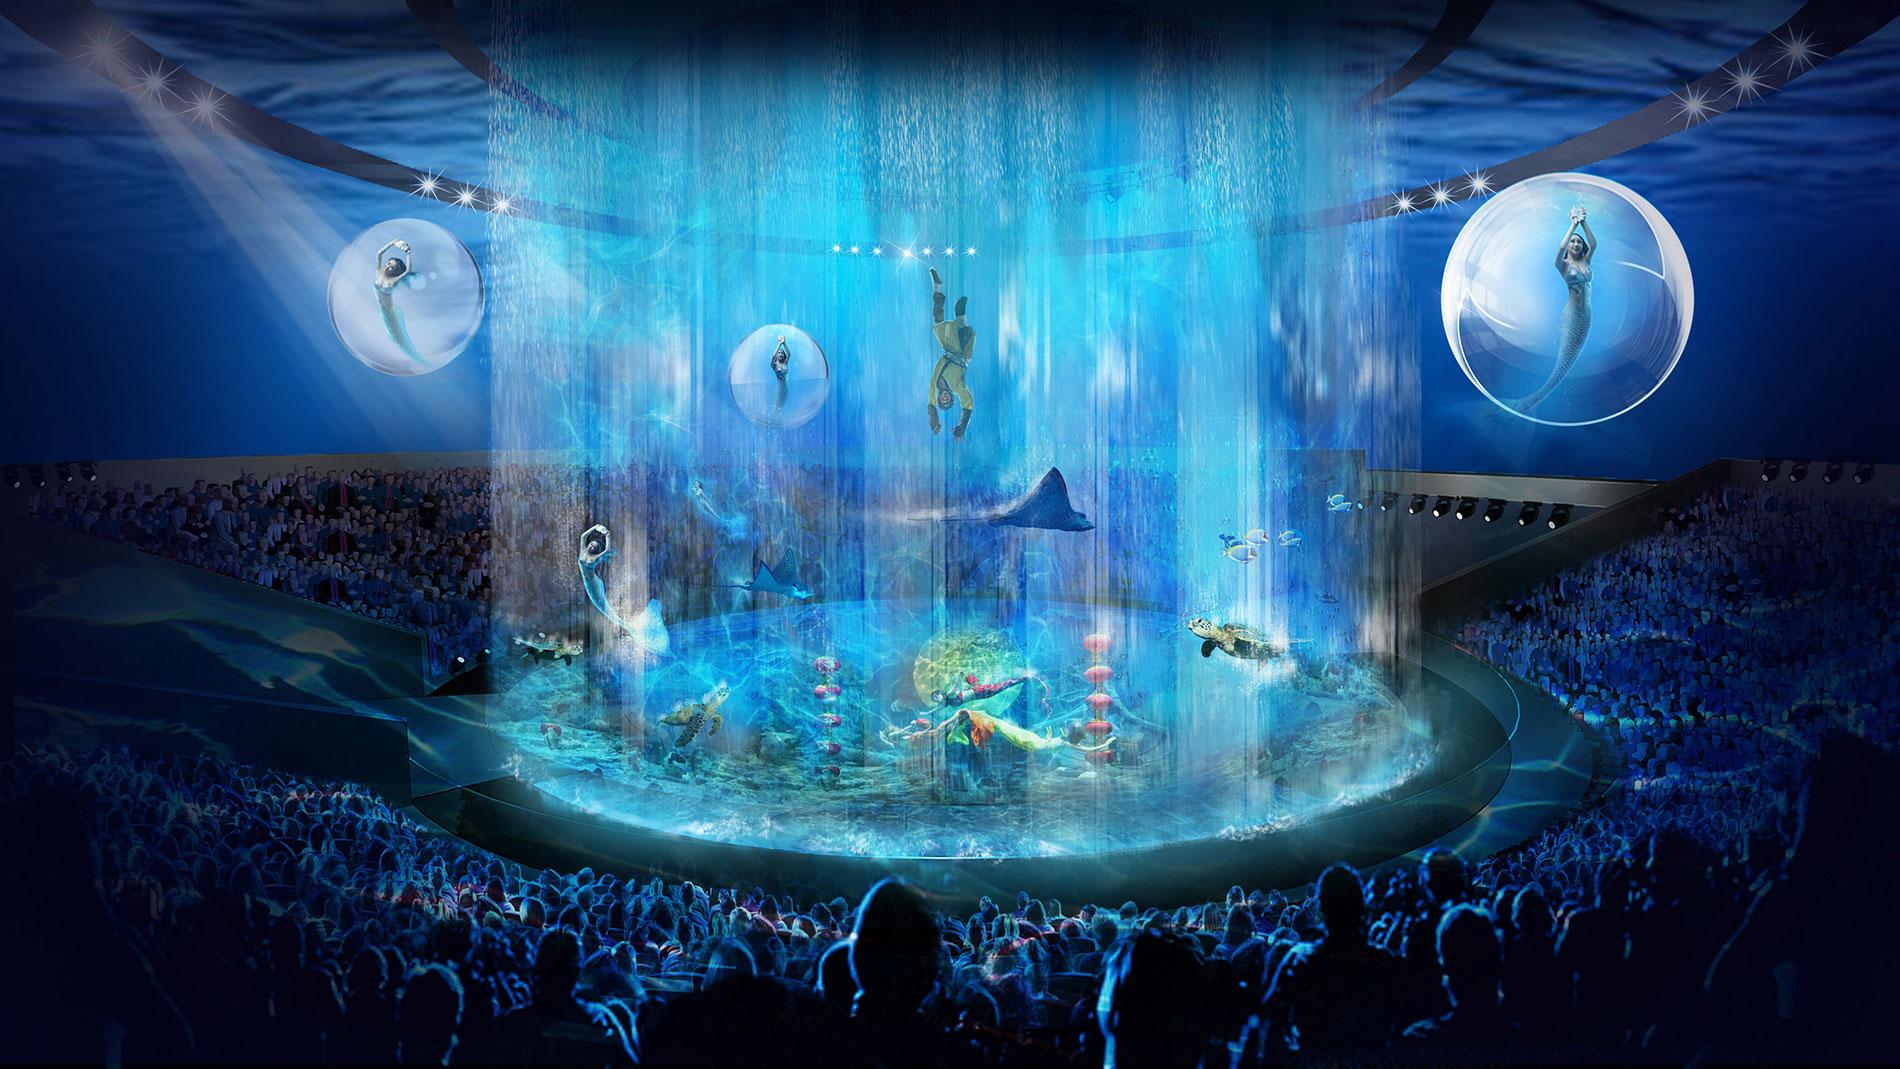 aquarium_v2_180316